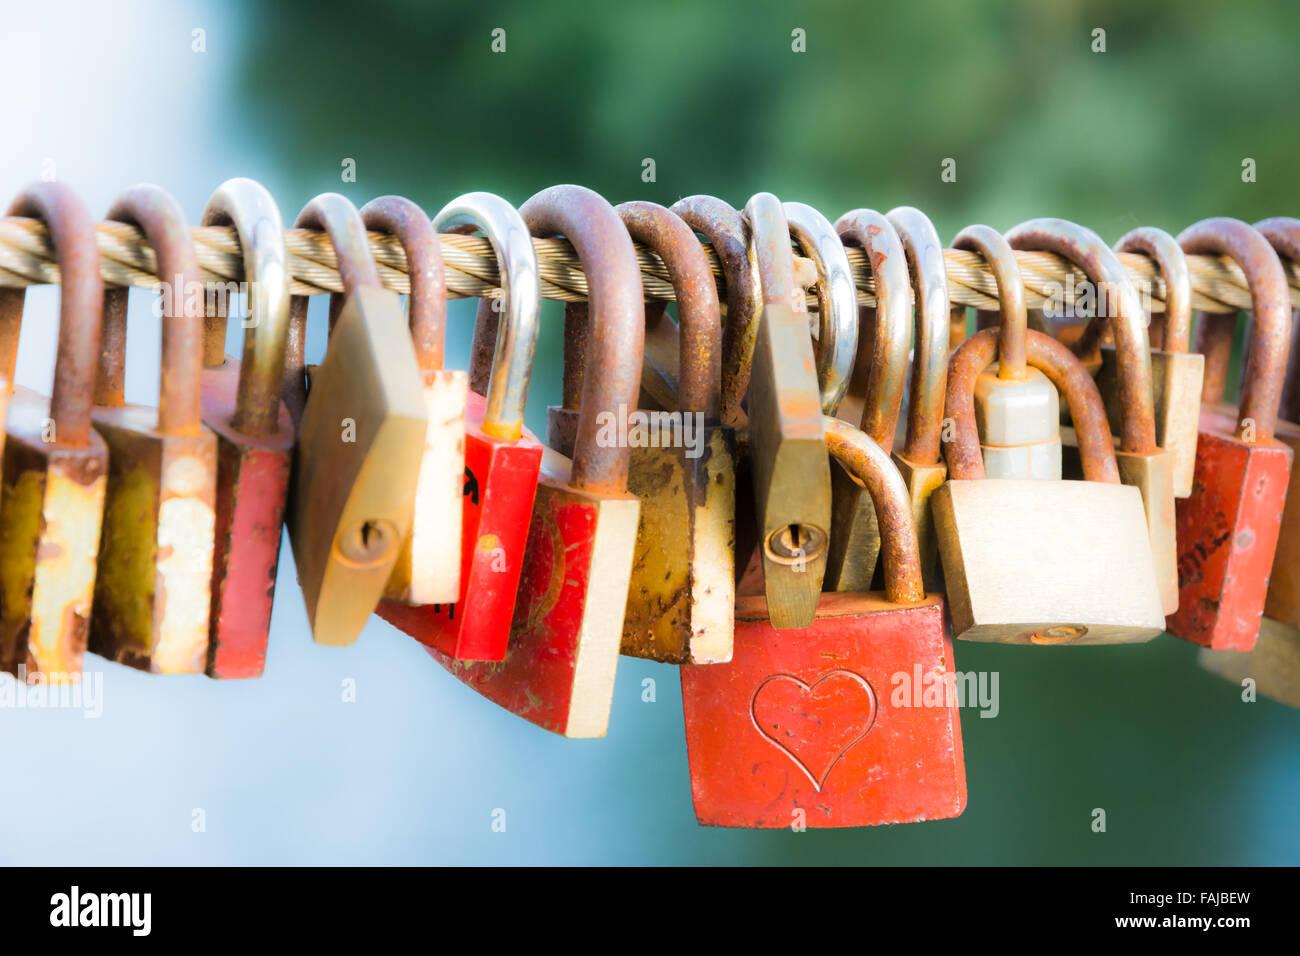 Love Locks As Symbol For Everlasting Love Stock Photo Royalty Free